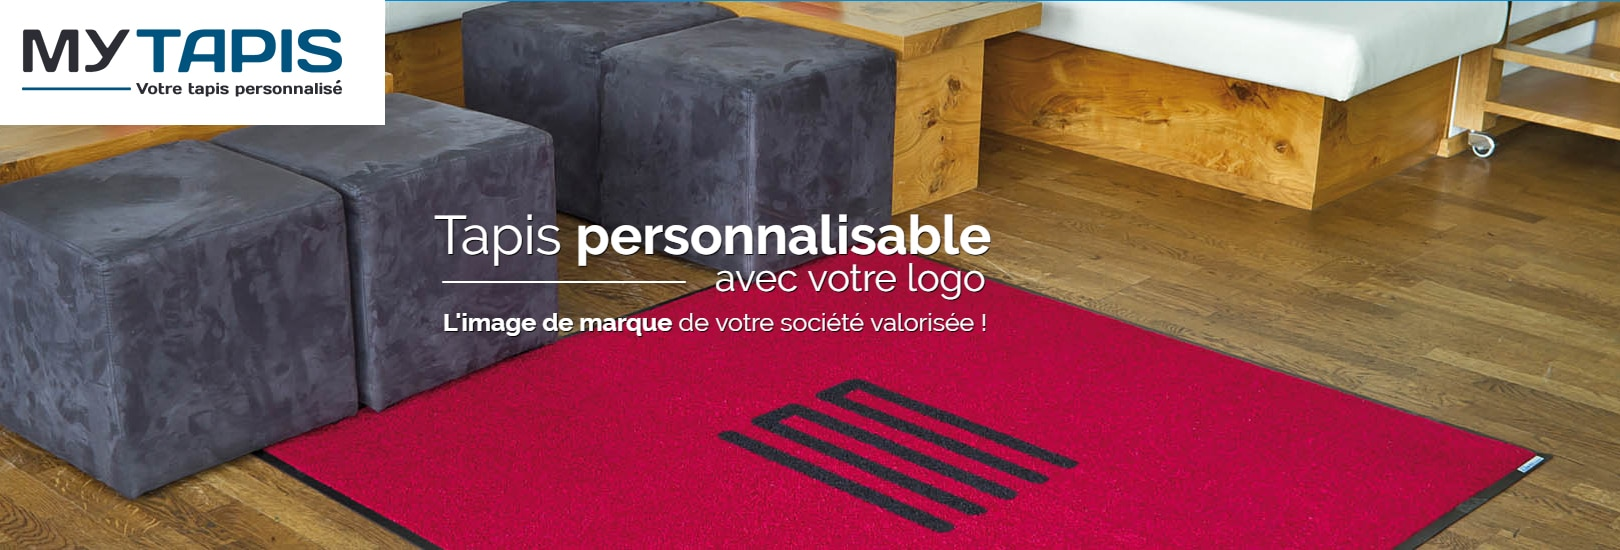 tapis personnalise avec logo tapis